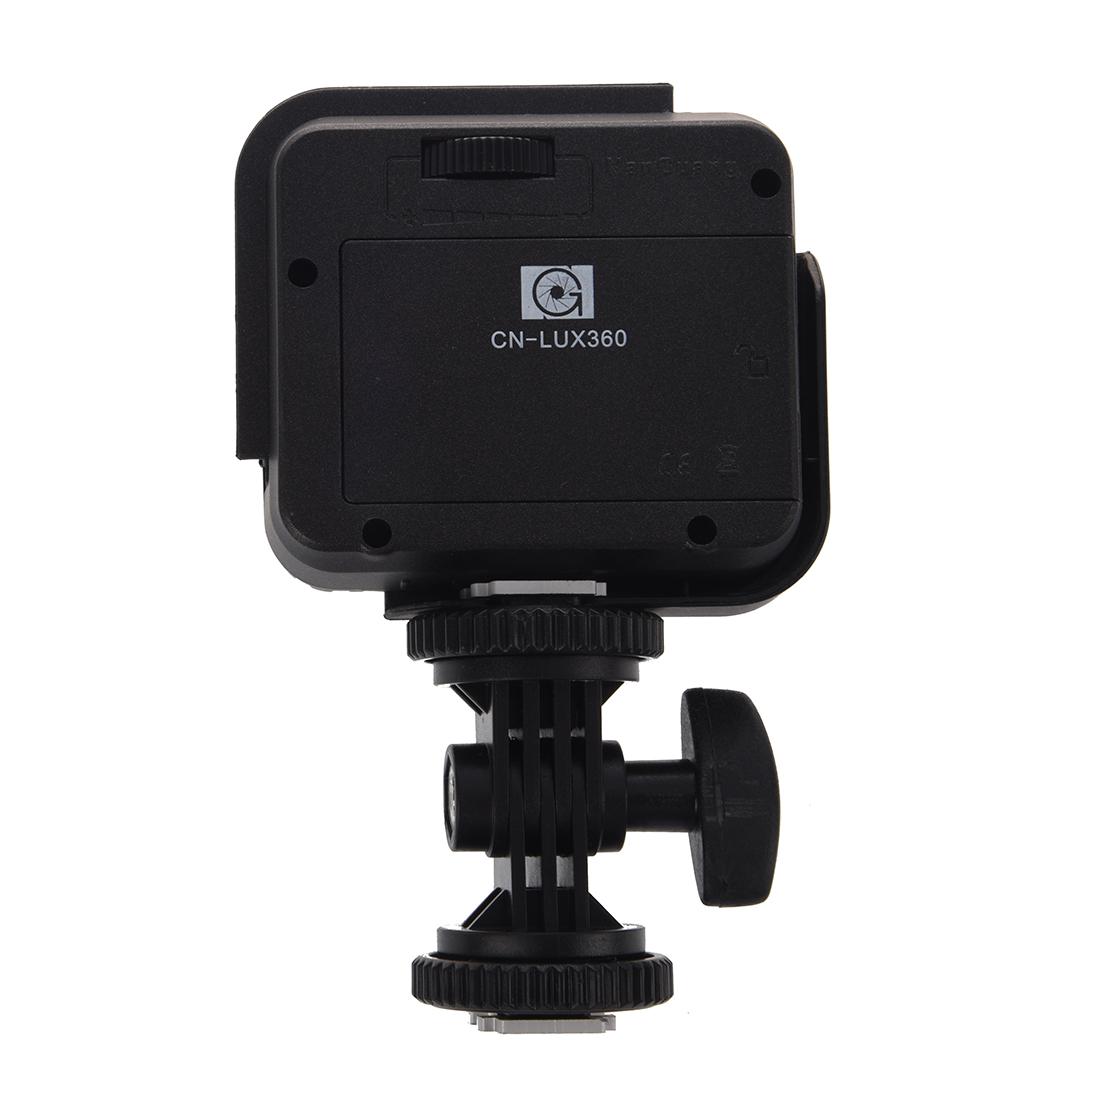 a1 cn lux360 led video licht lampe fuer kamera video. Black Bedroom Furniture Sets. Home Design Ideas